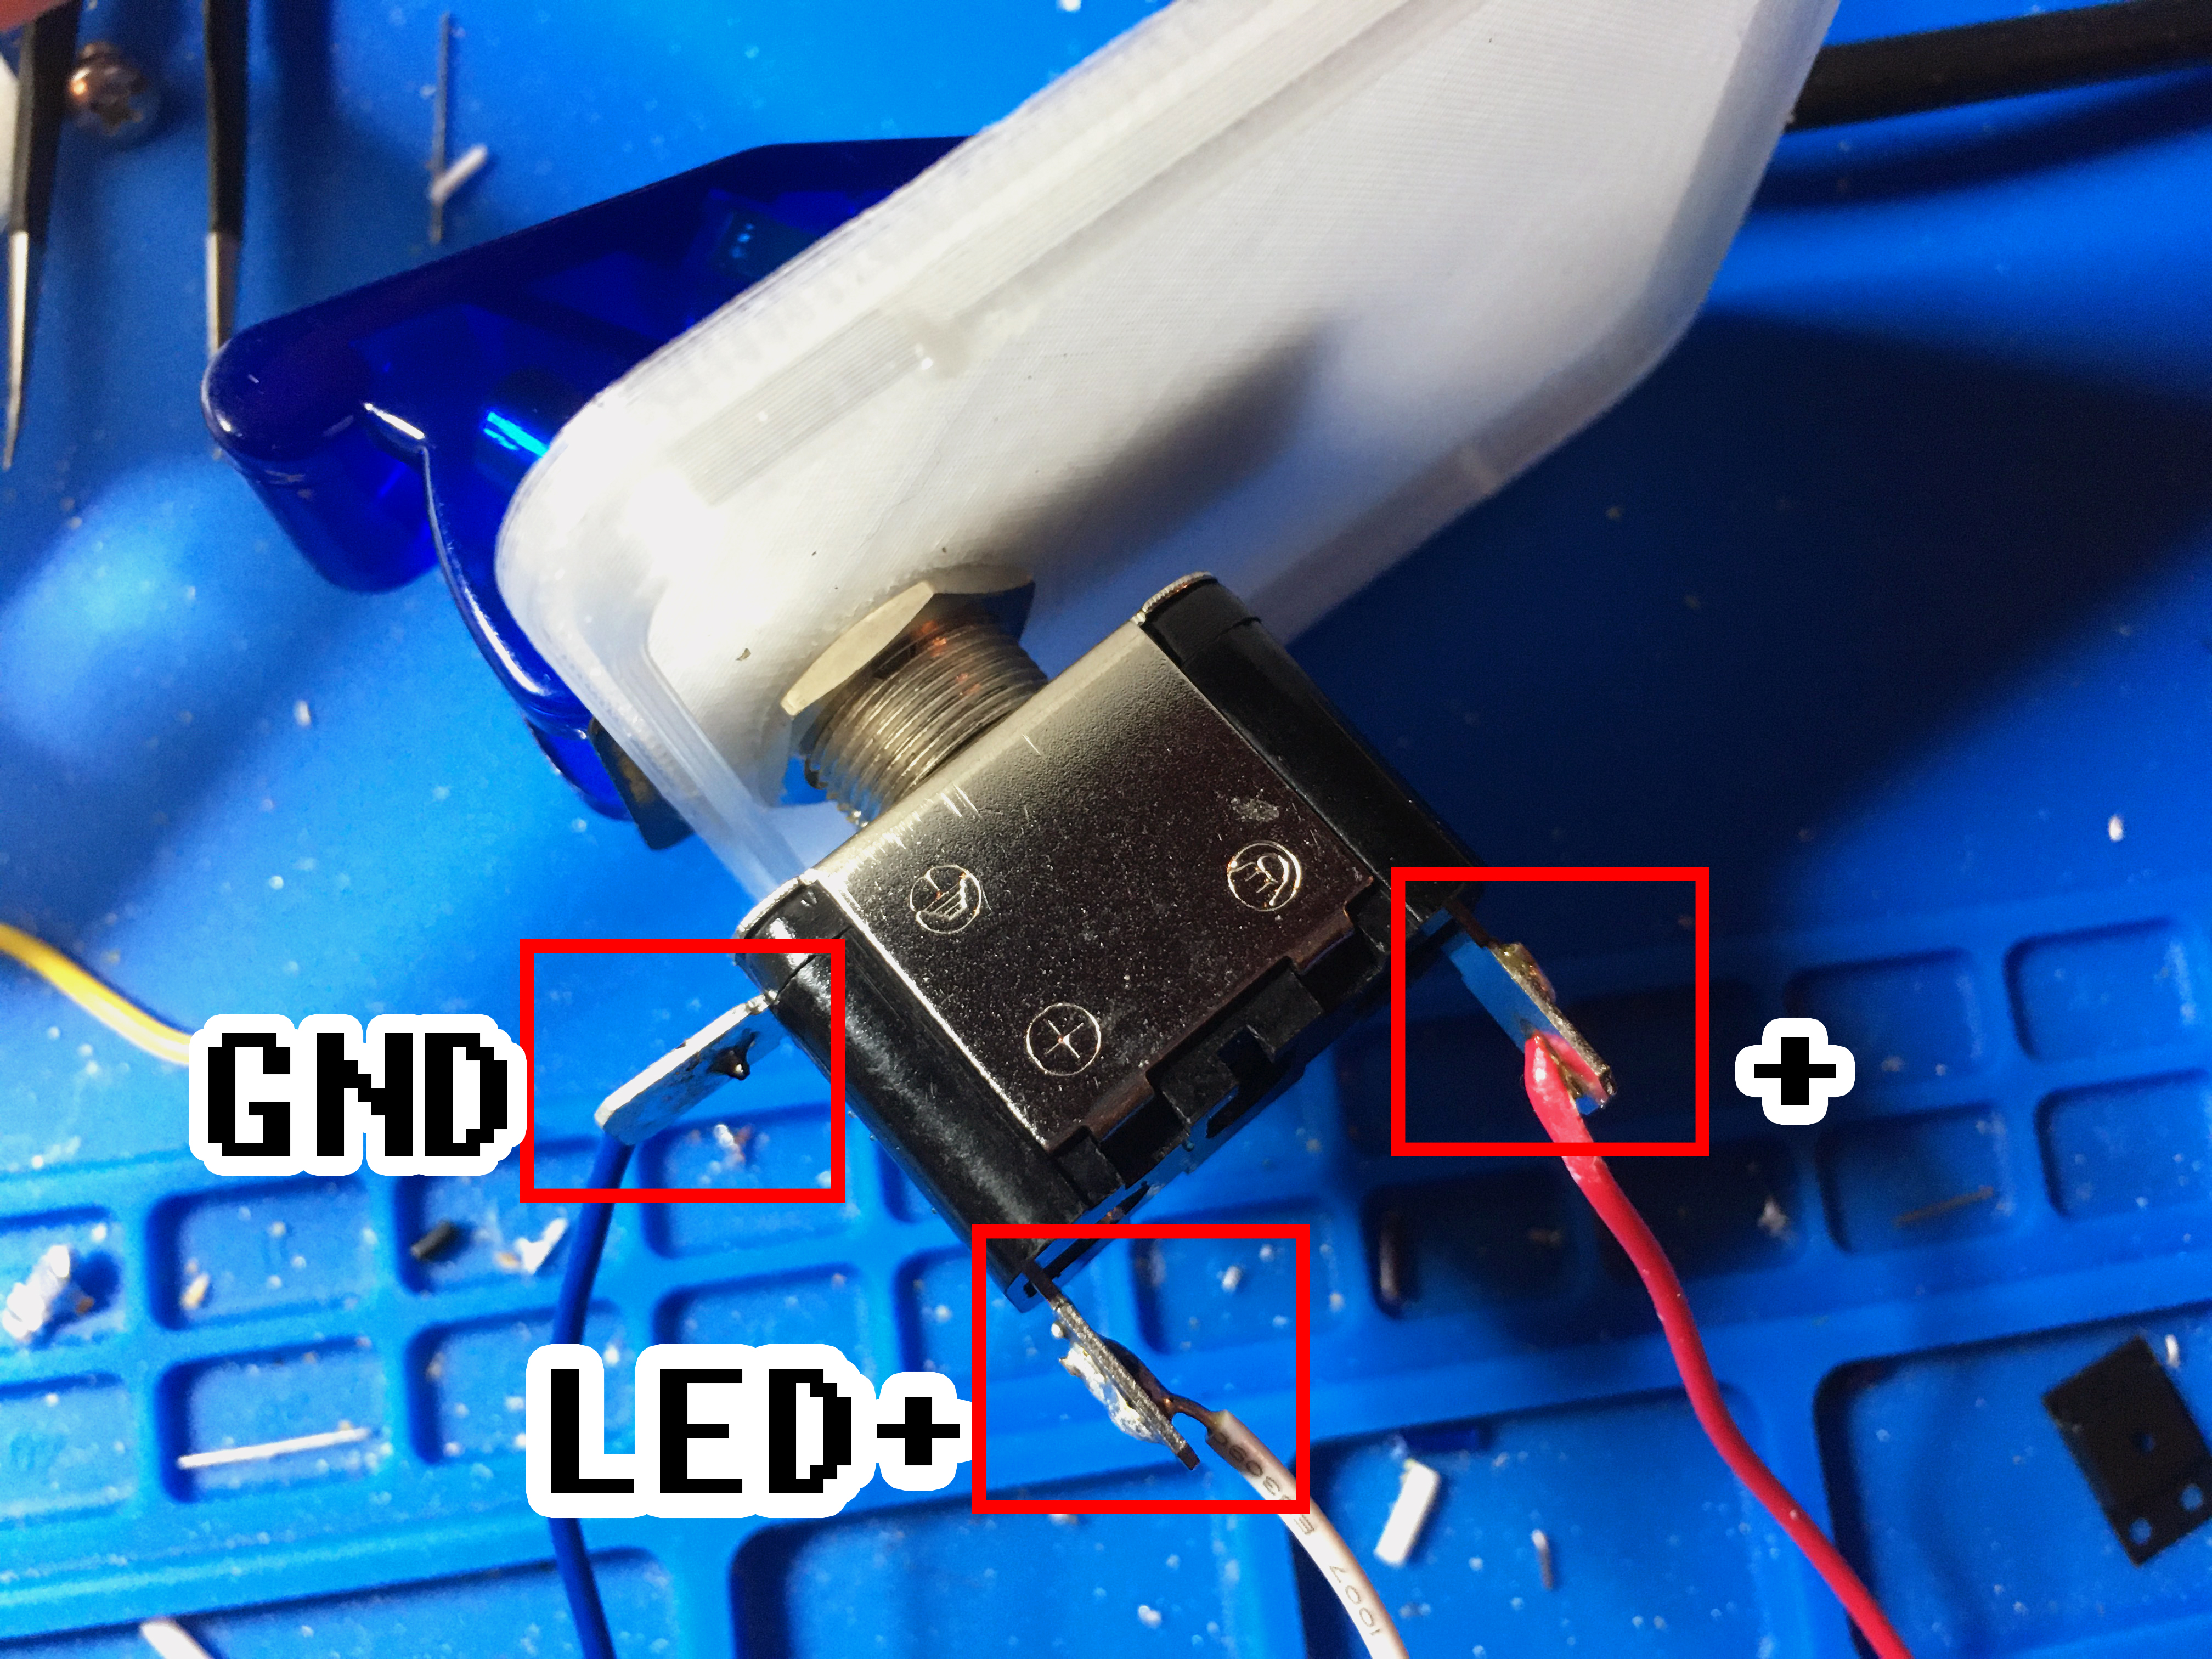 circuitpython_IMG_0008_edited.jpg